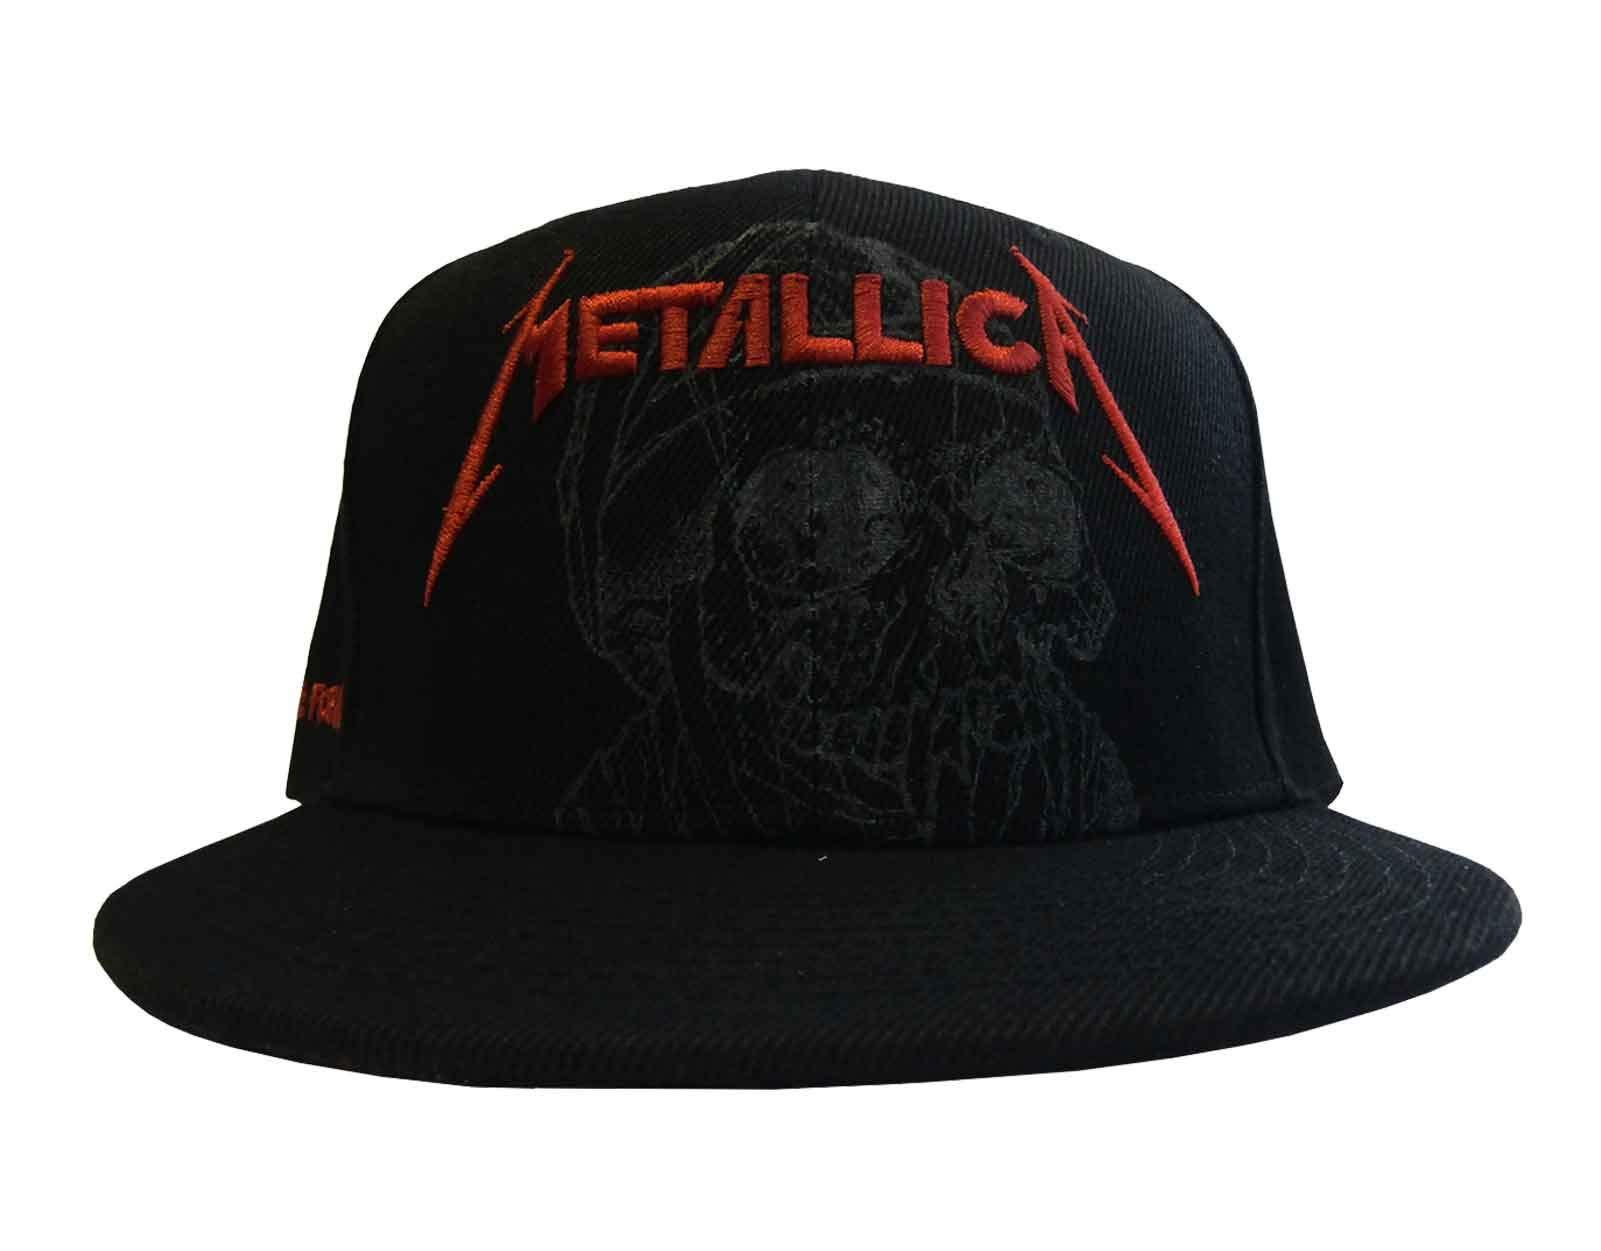 Metallica Snapback Cap One Justice Black